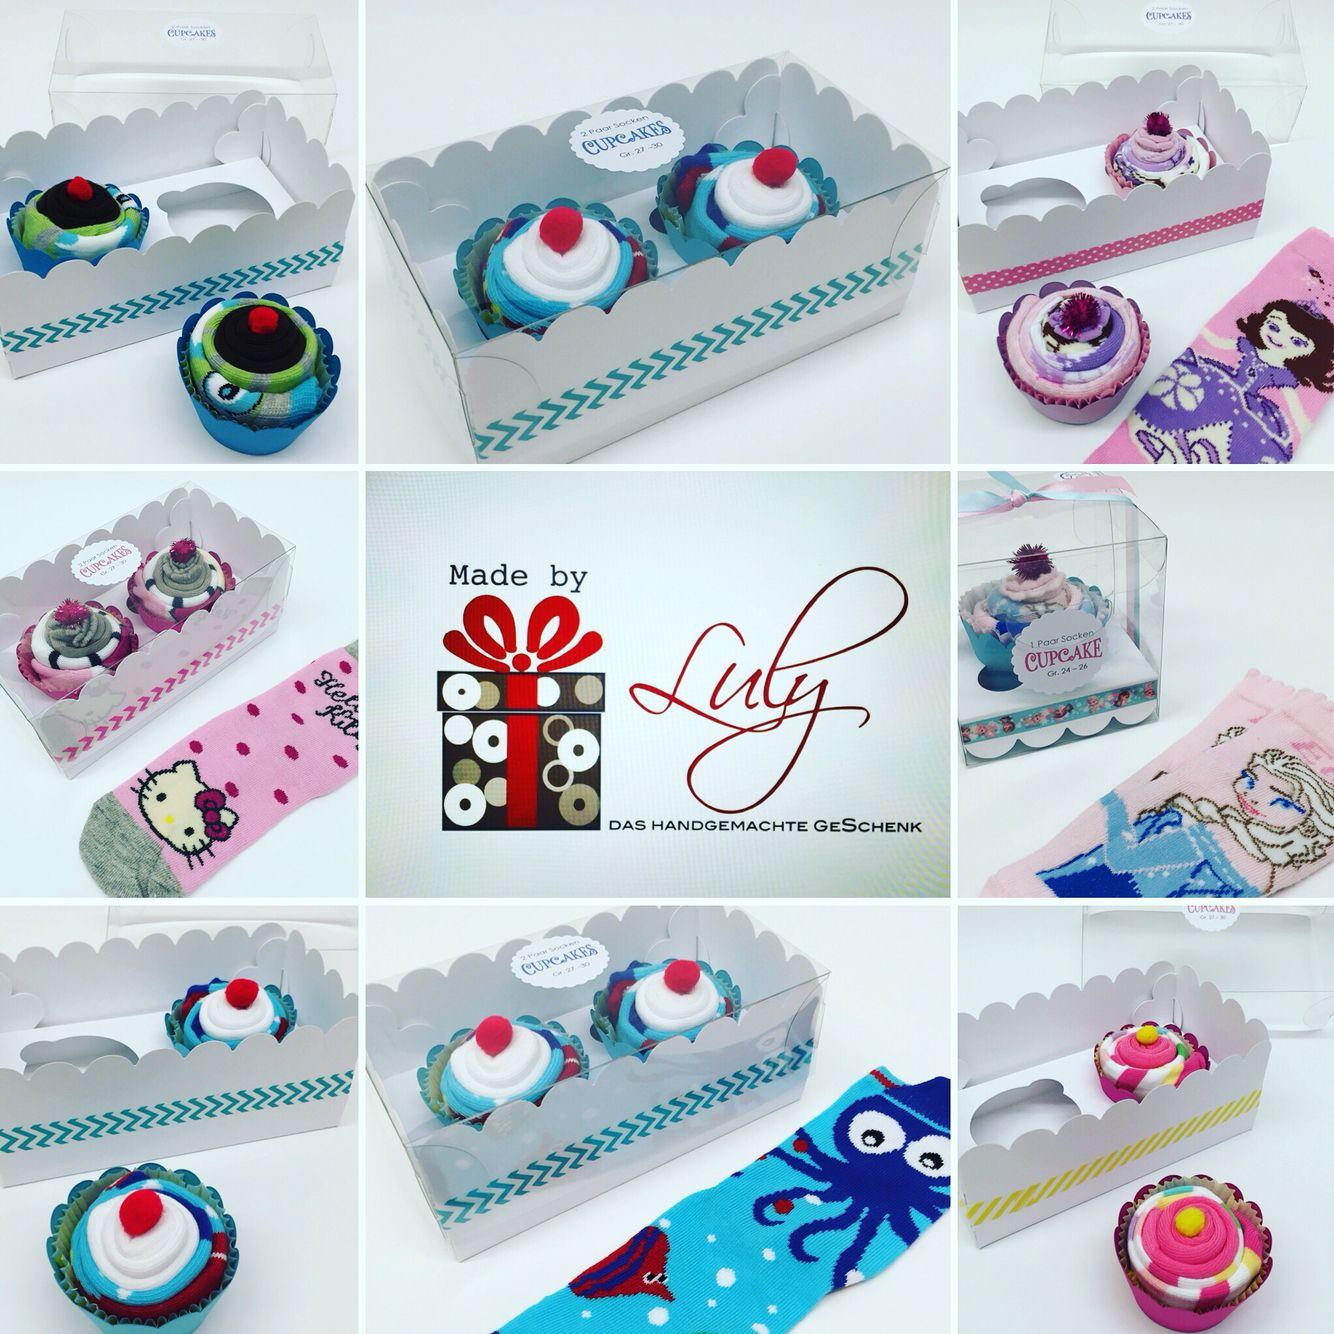 Cupcakes aus Kindersocken handgemachte Geschenk www.facebook.com/madebyLuly